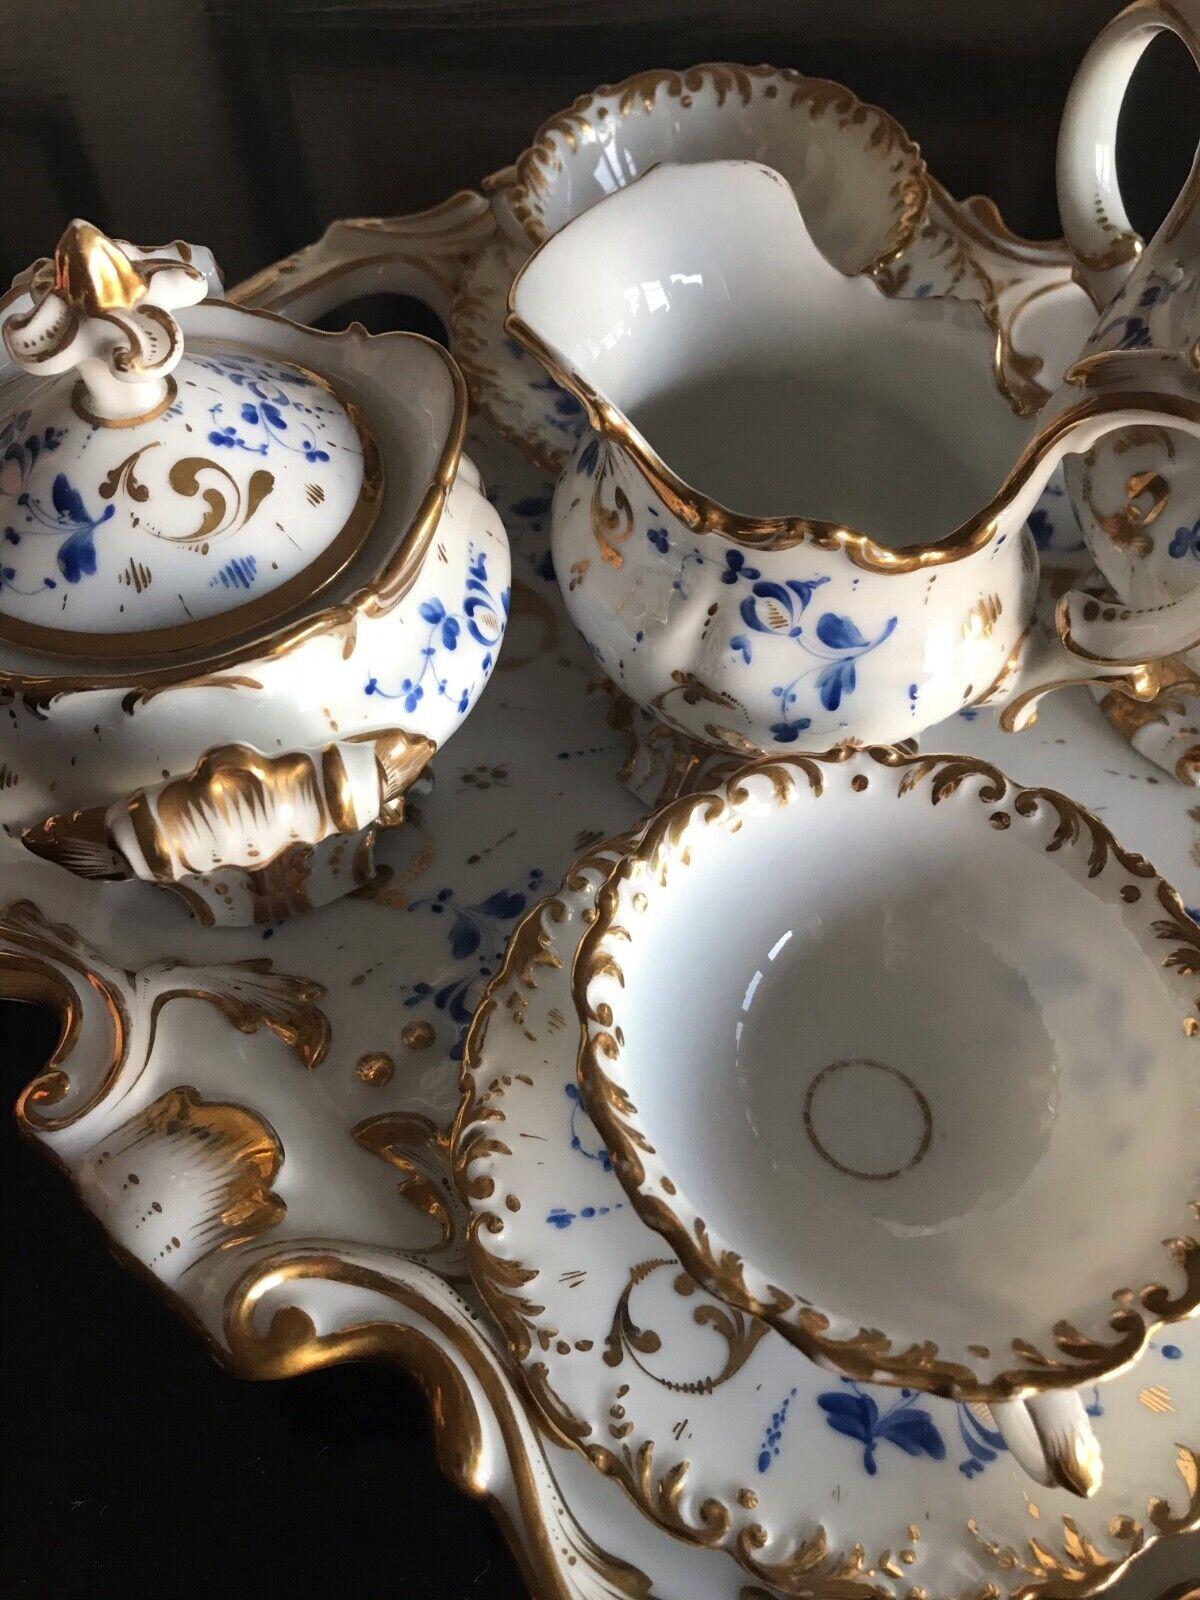 Antico servizio da tè francese in porcellana